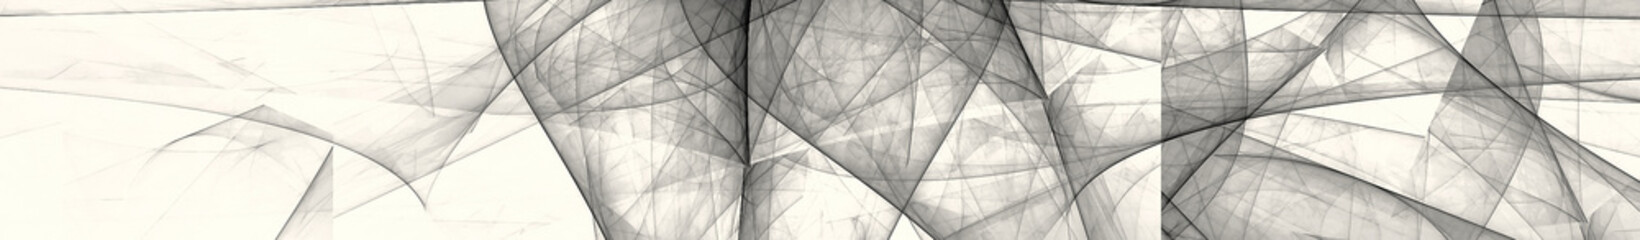 White and black abstract image. Gorizontal panoramic view for kithen panel skinali. 3d render